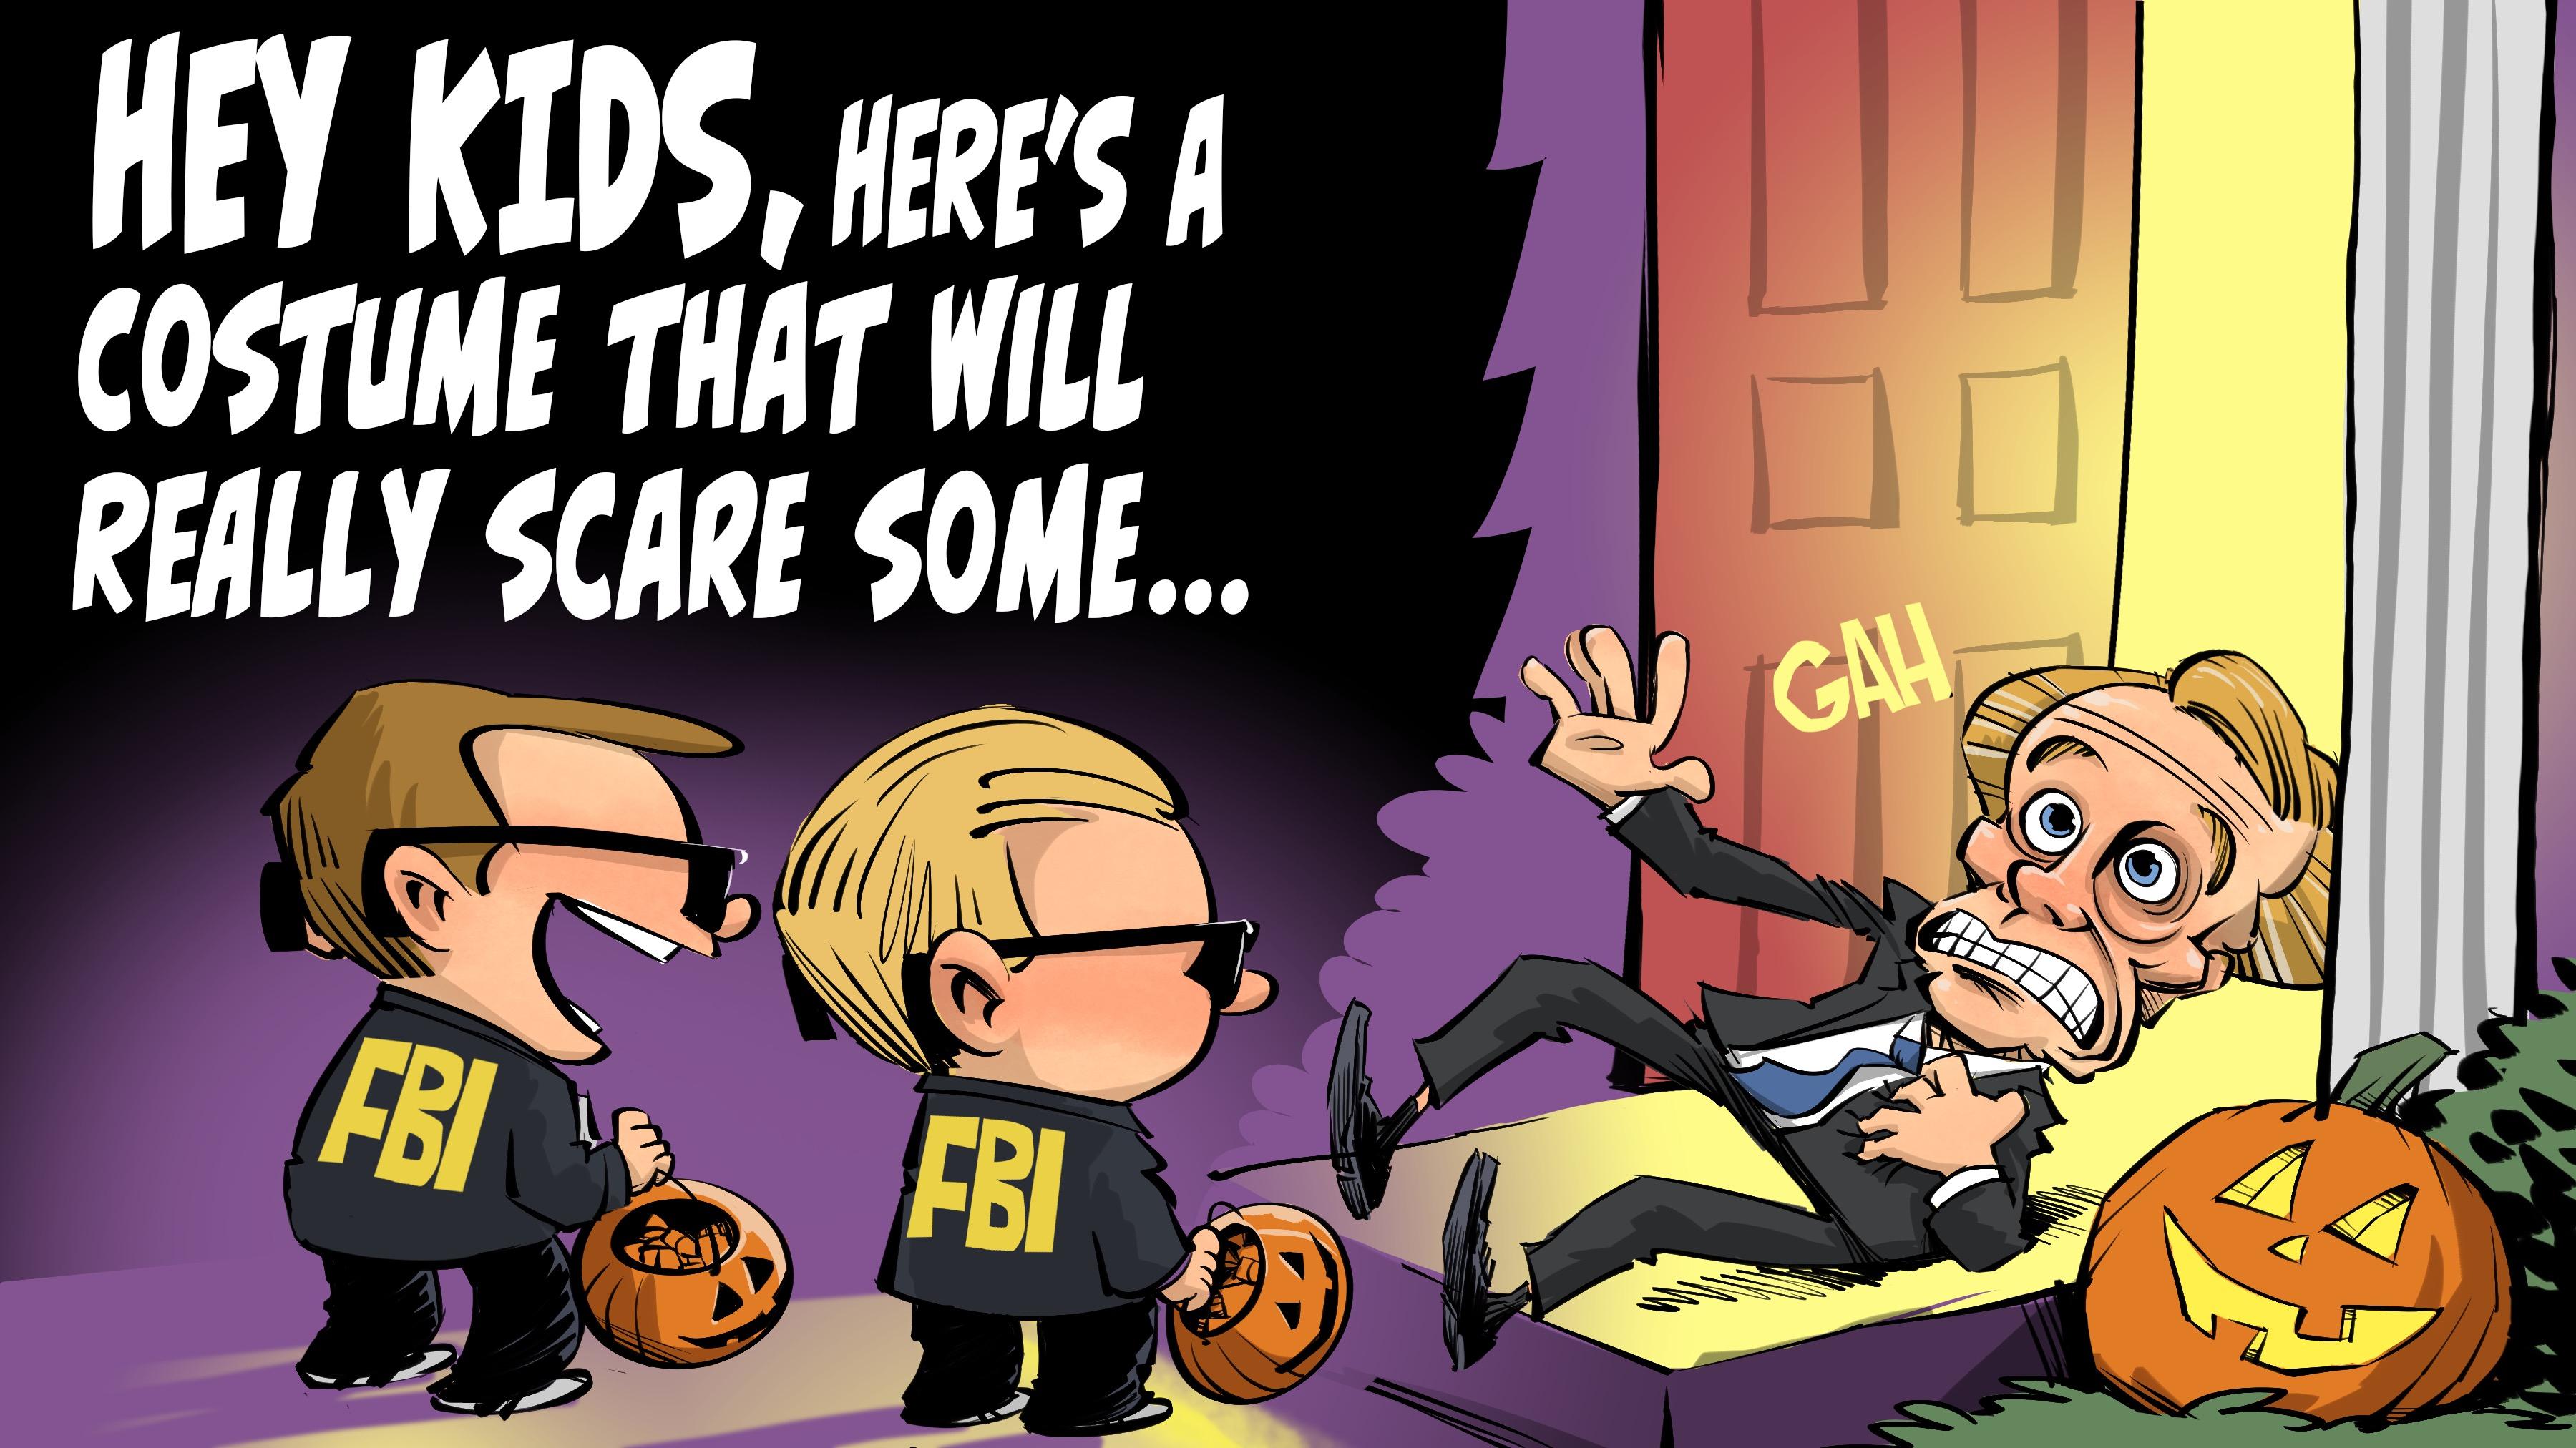 FBI Halloween costumes at Madigan's house